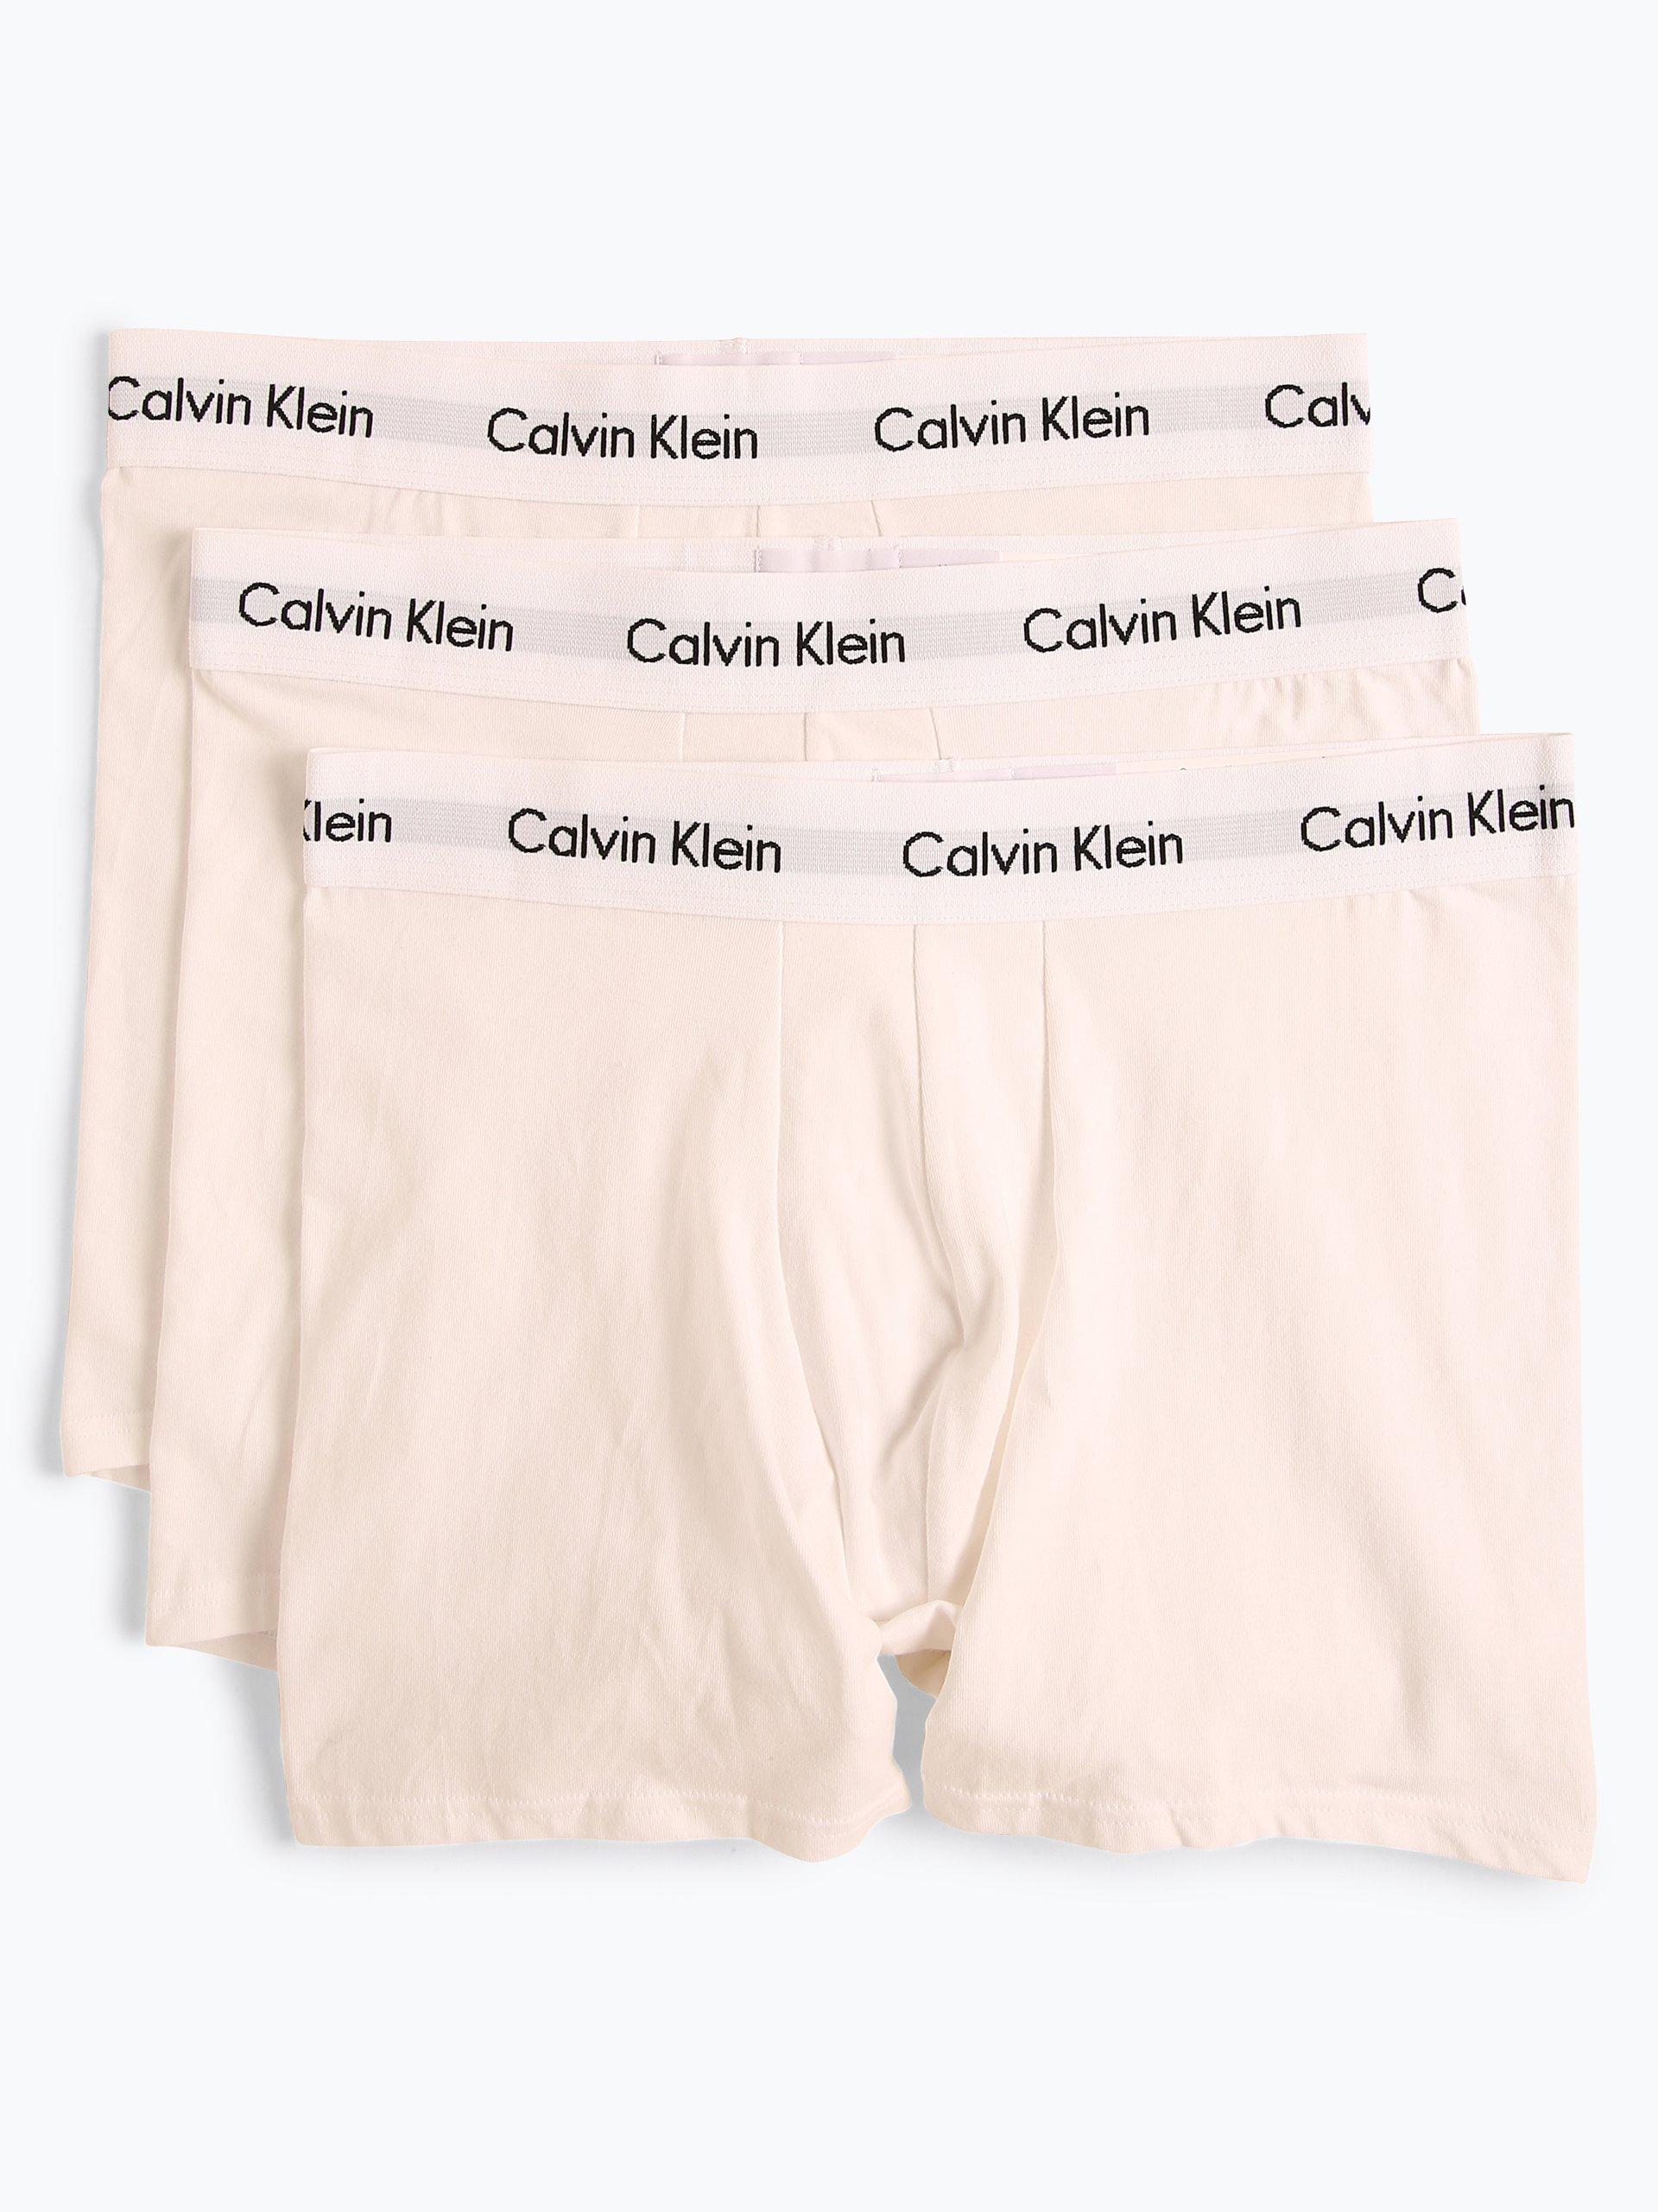 Calvin Klein Obcisłe bokserki męskie pakowane po 3 szt.